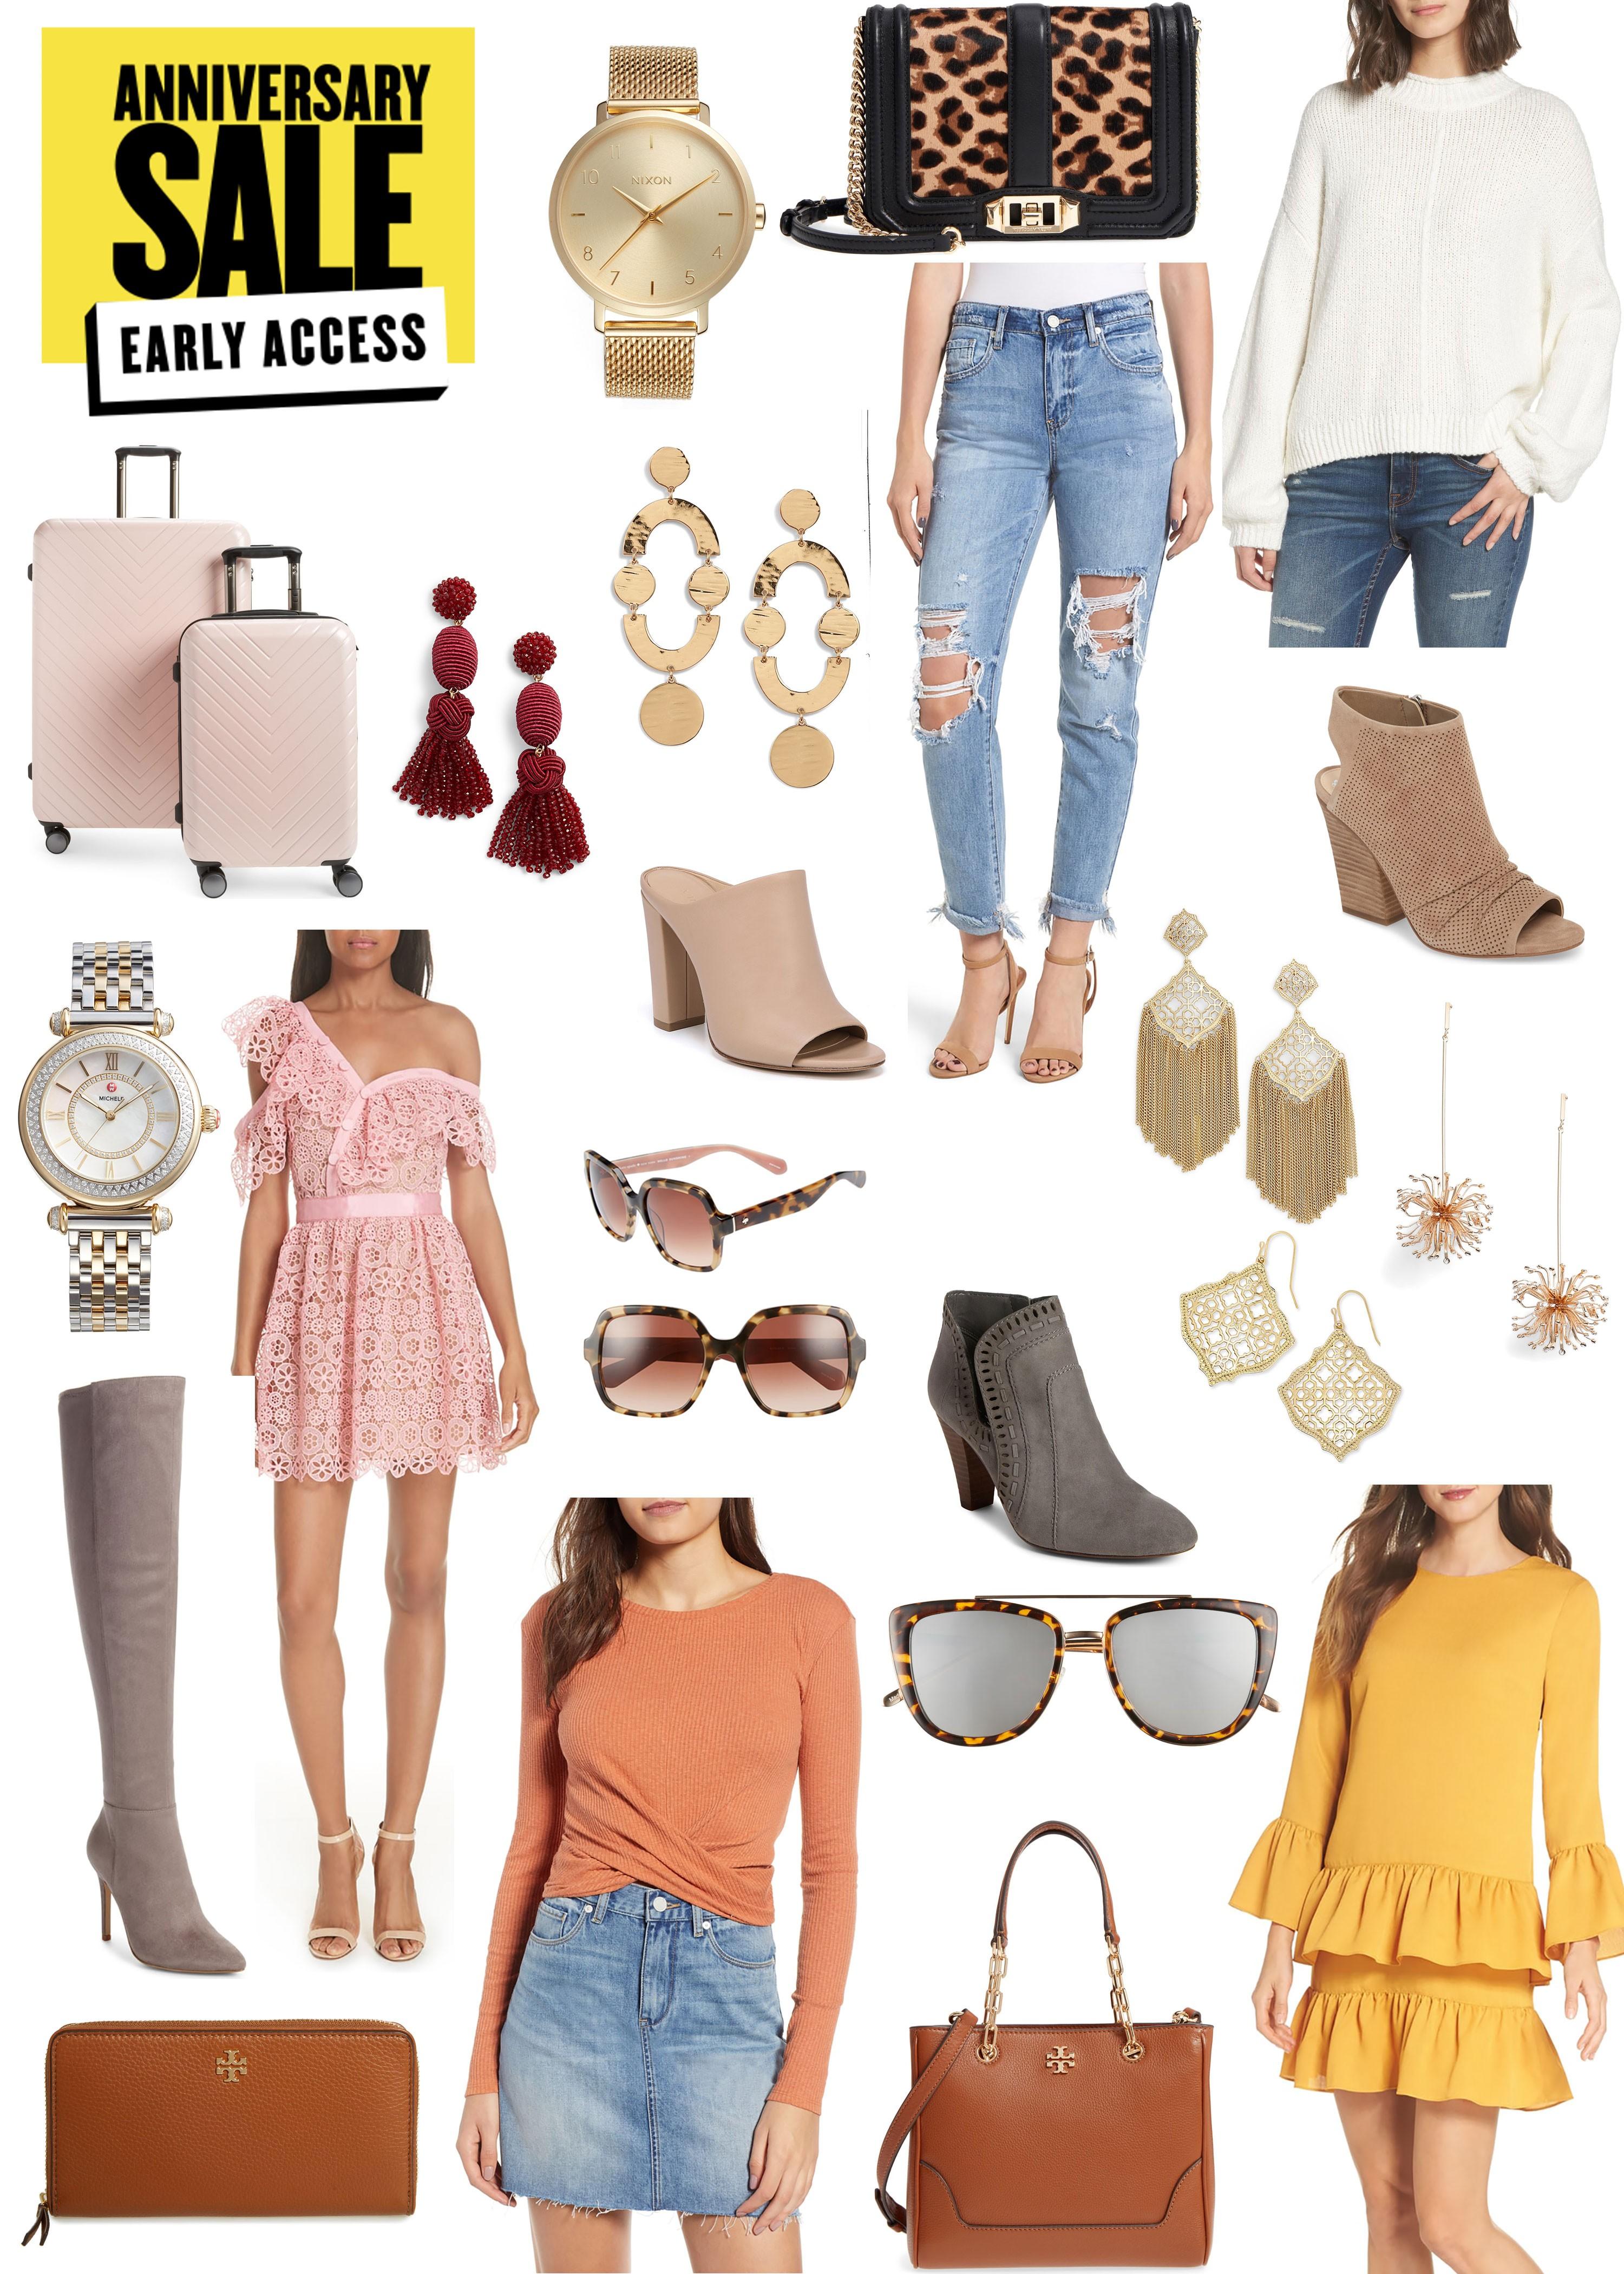 d1d06d5841 Nordstrom Anniversary Sale Early Access | Fashion | Sunshine & Stilettos